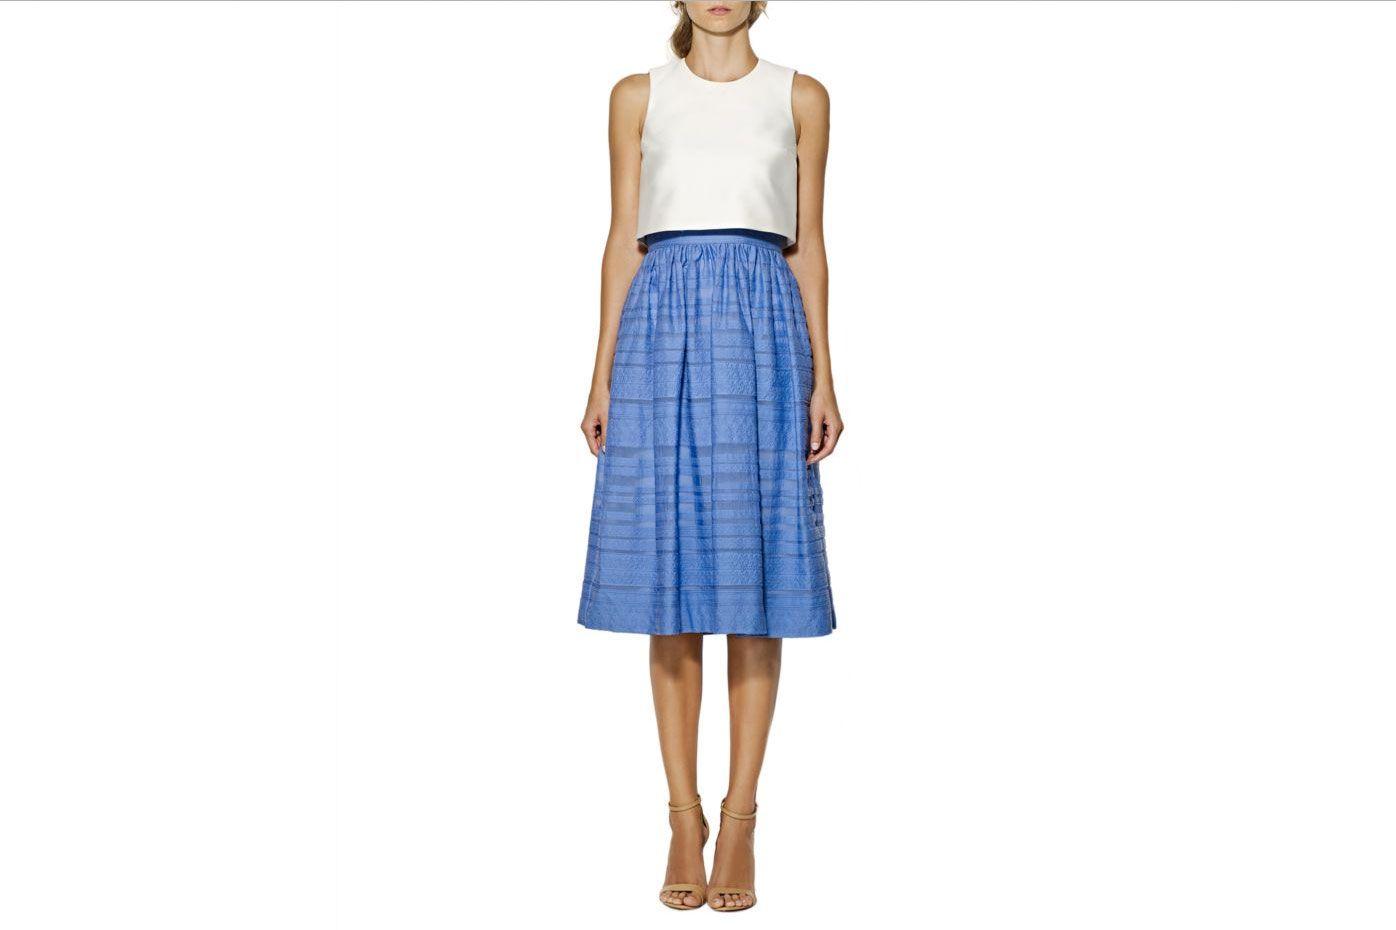 Cynthia Rowley Sleeveless Tea-Length Dress